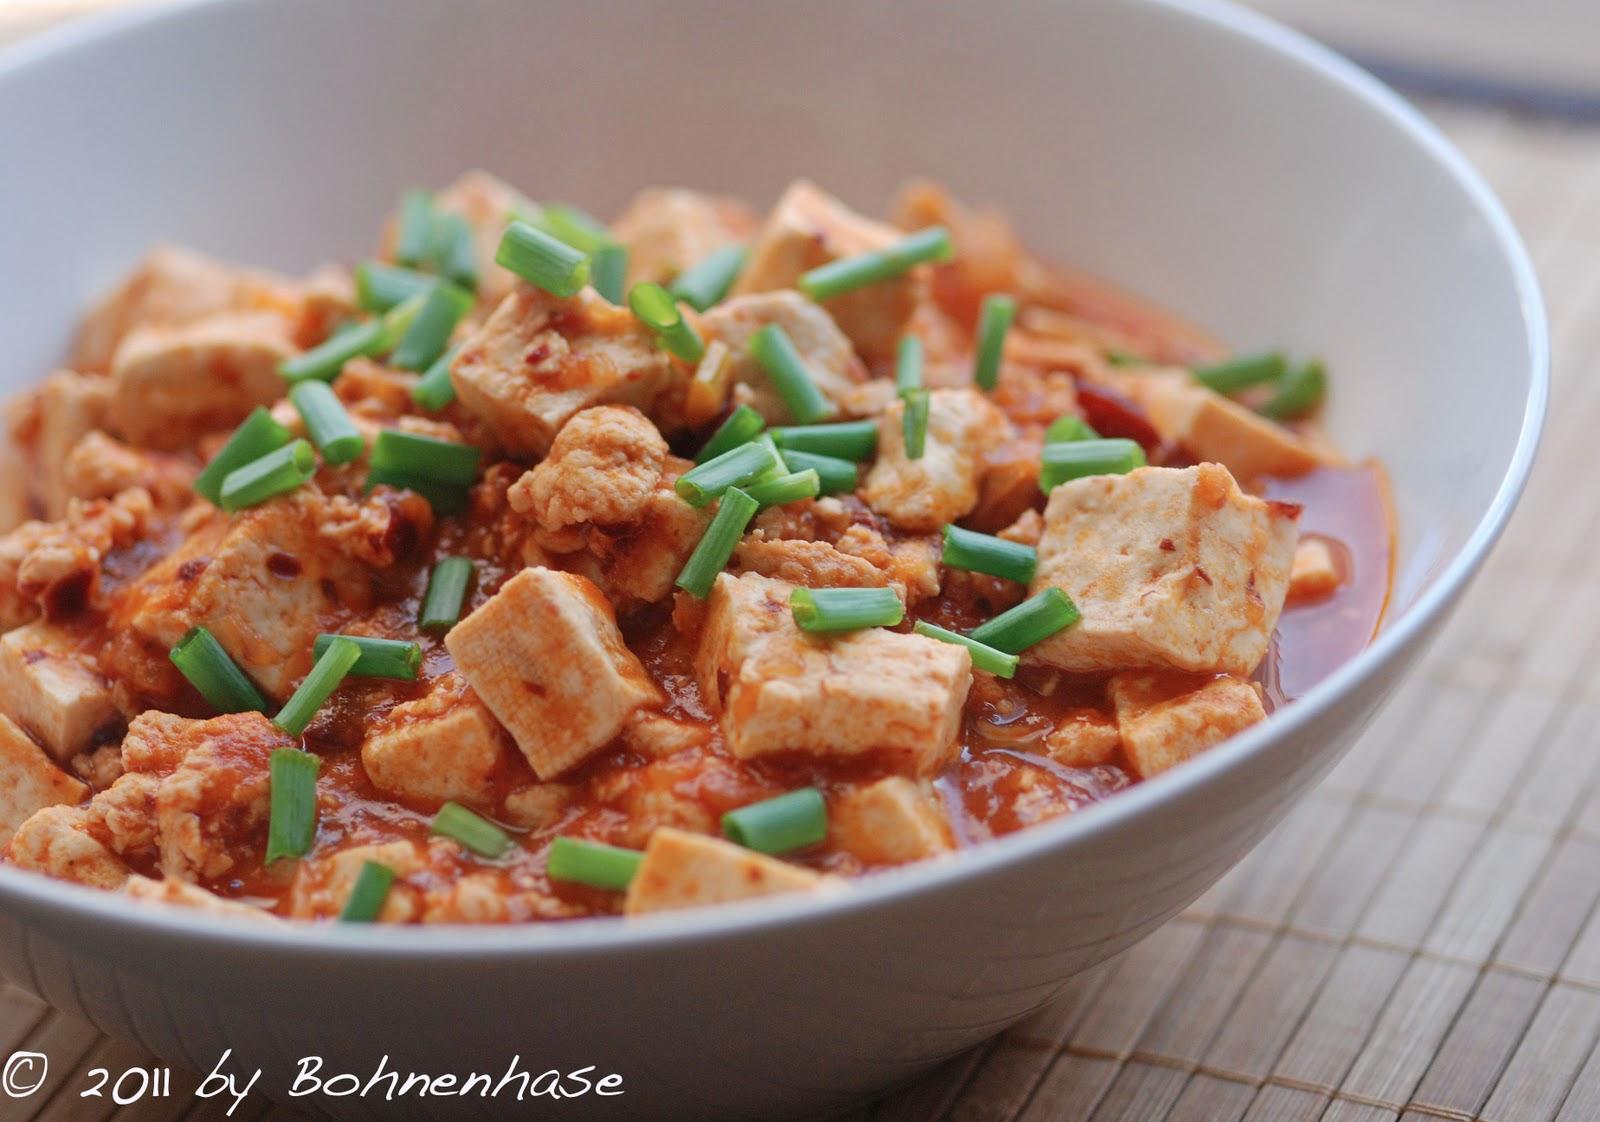 Bohnenhase Bento: Mapo Tofu or Mapo Doufu / 麻婆豆腐